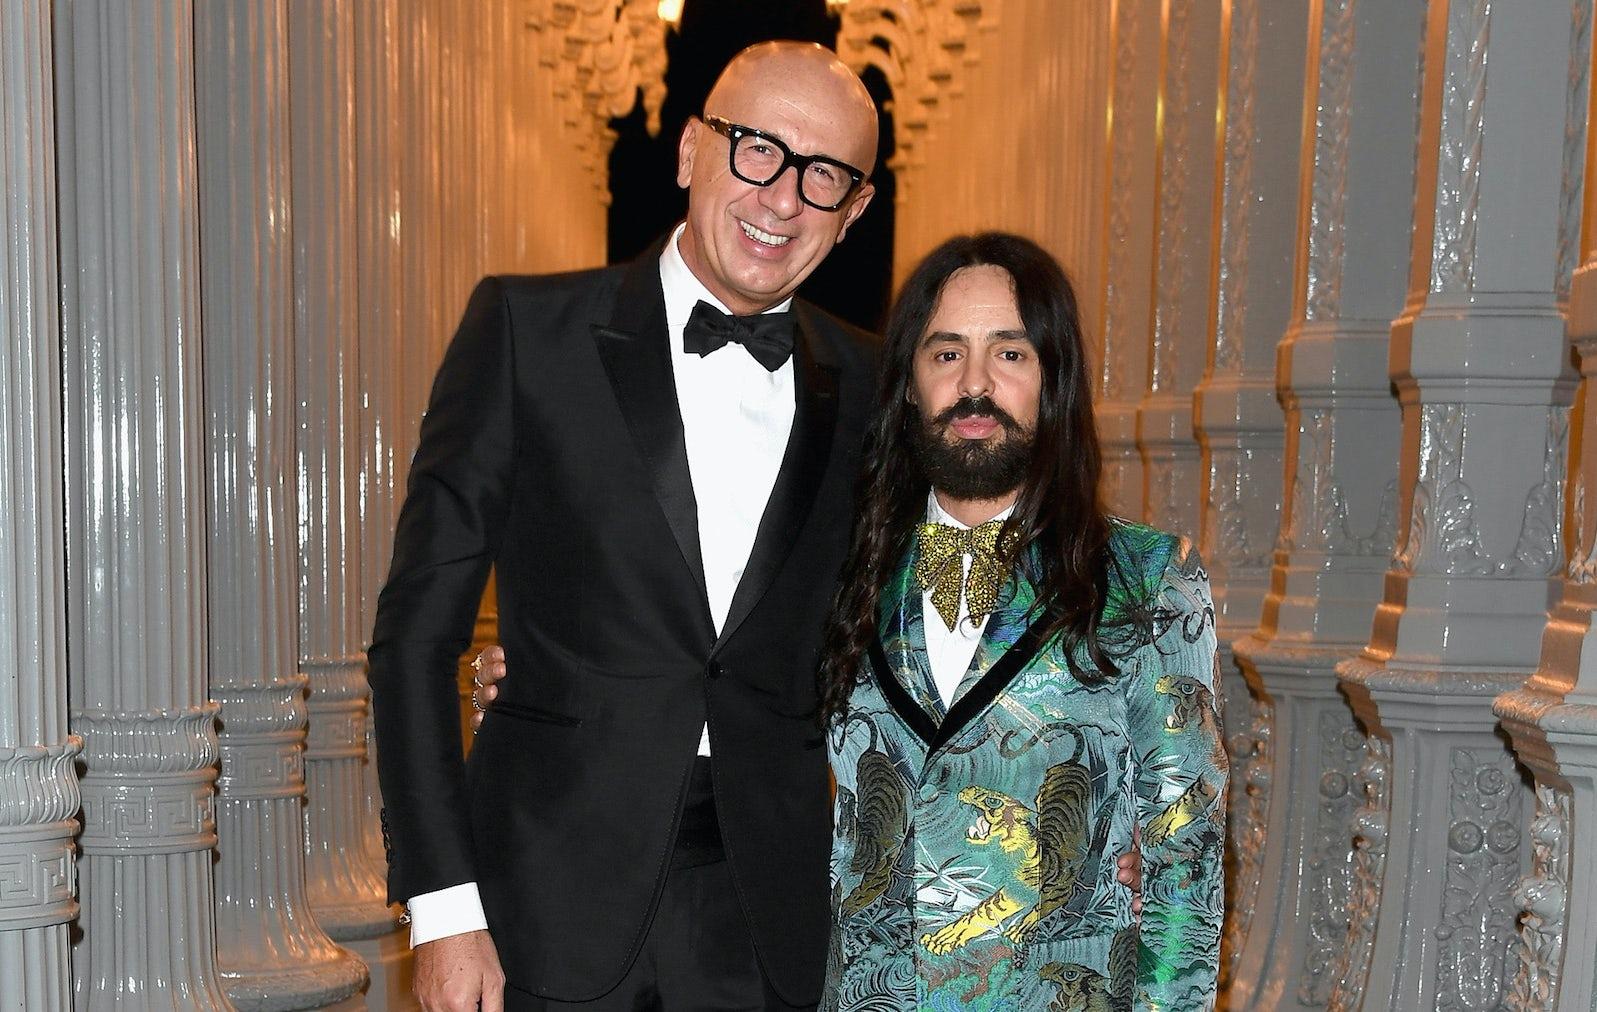 Gucci chief executive Marco Bizzarri with Gucci creative director Alessandro Michele | Source: Getty Images